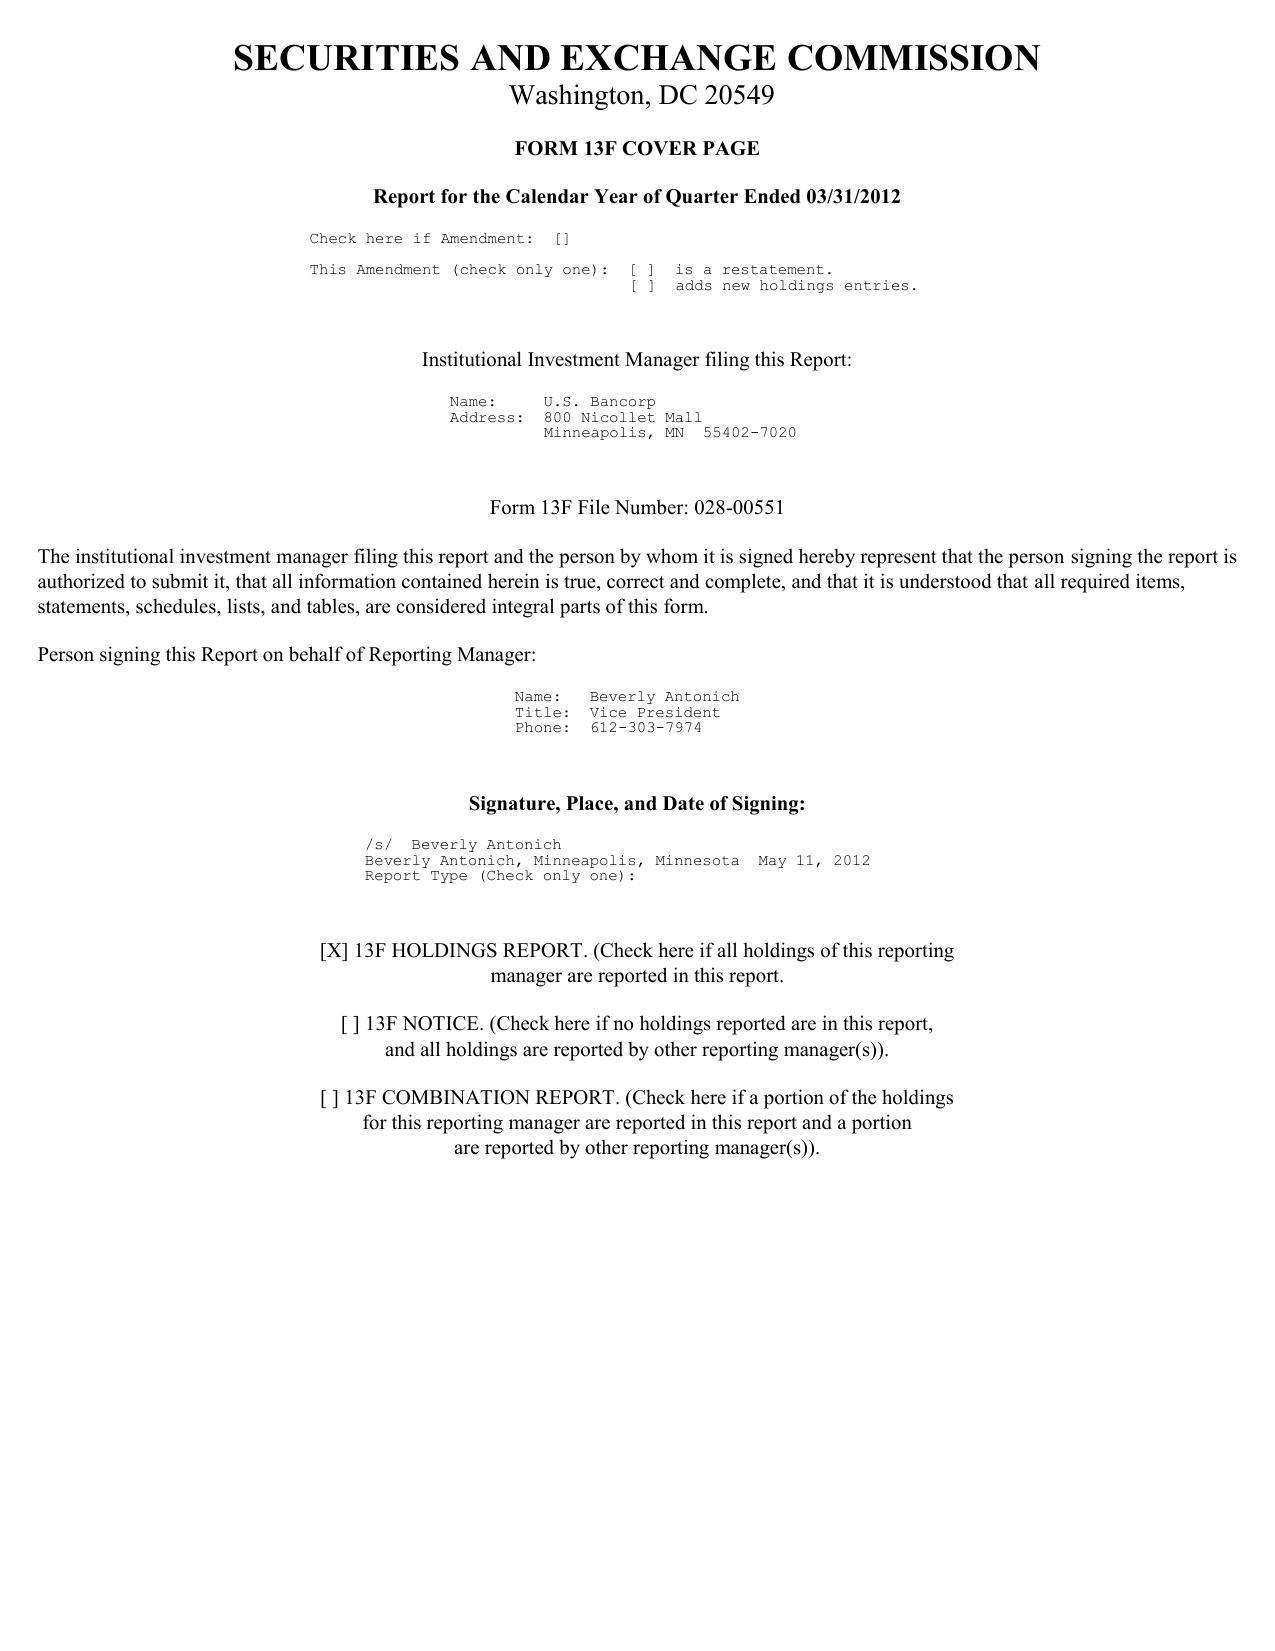 Form: 13F-HR, Received: 05/11/2012 16:32:34